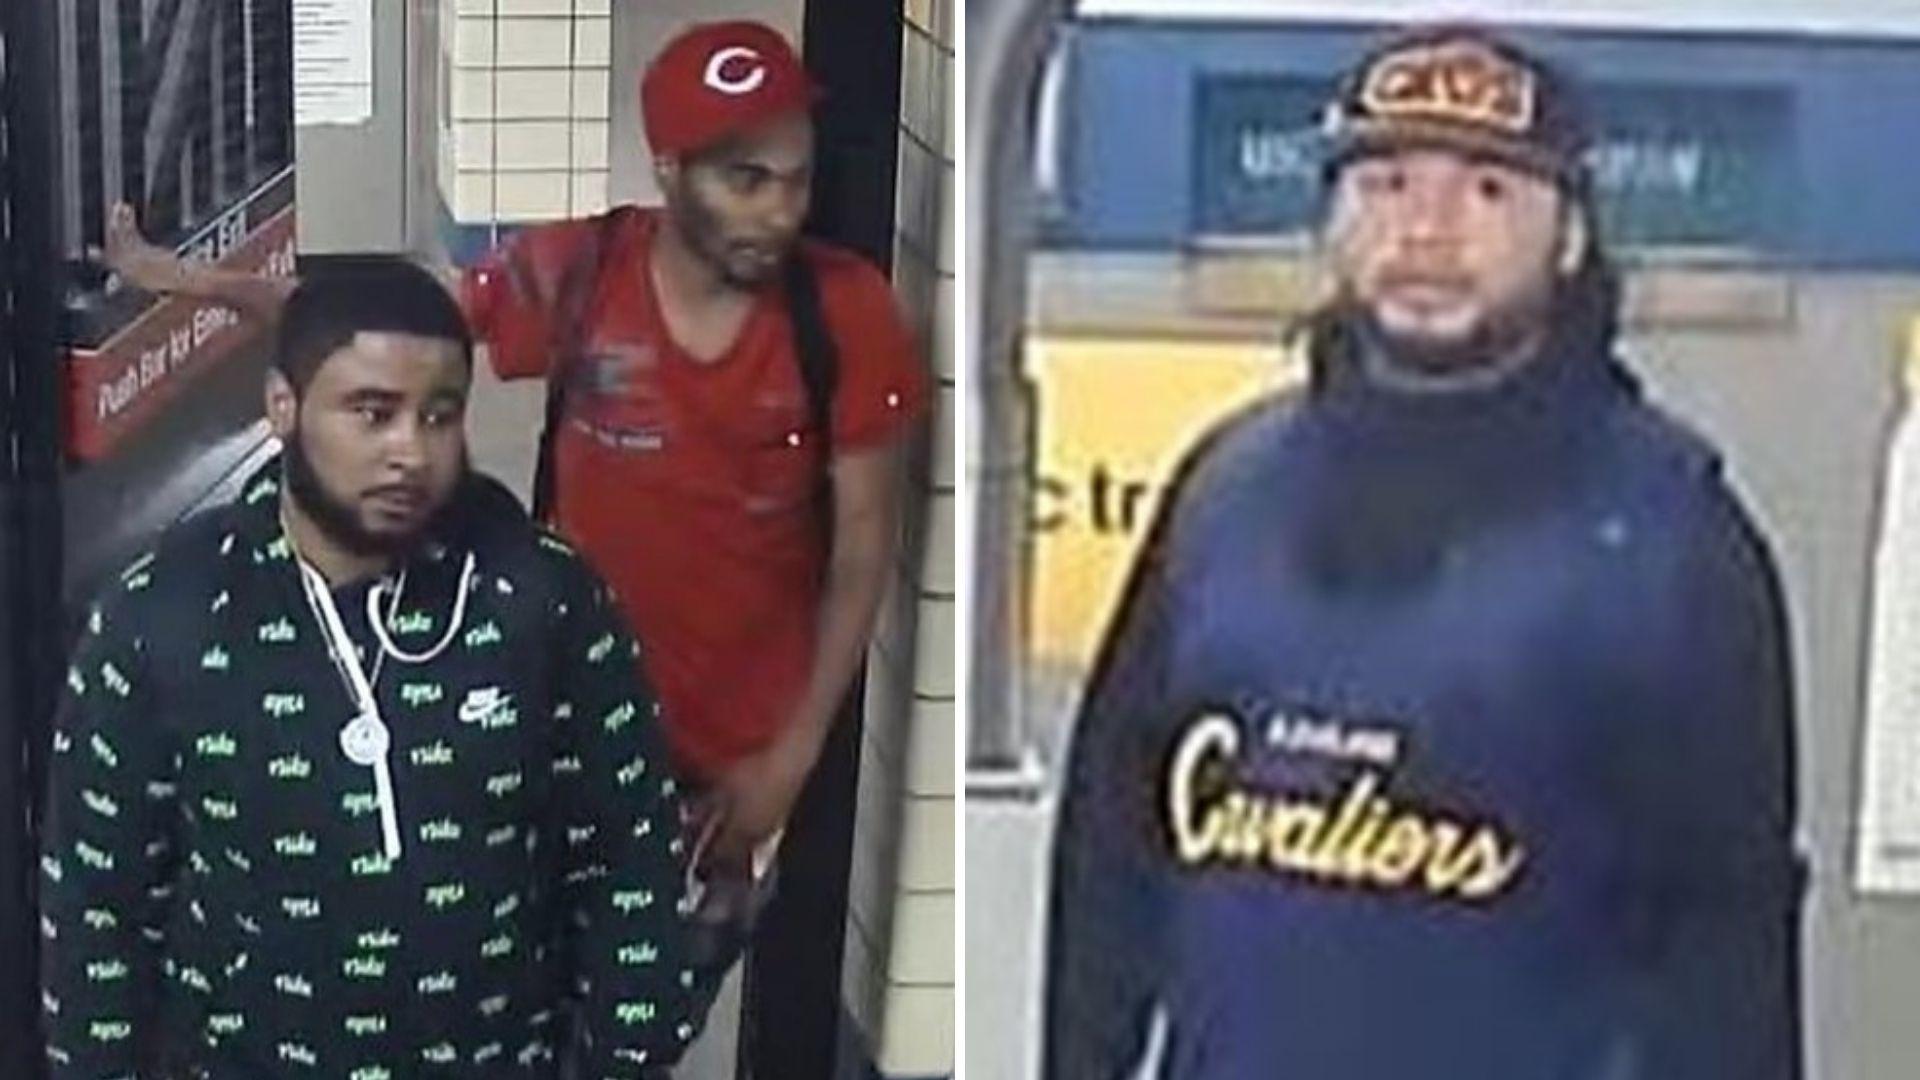 Cypress Hills subway slashing suspects